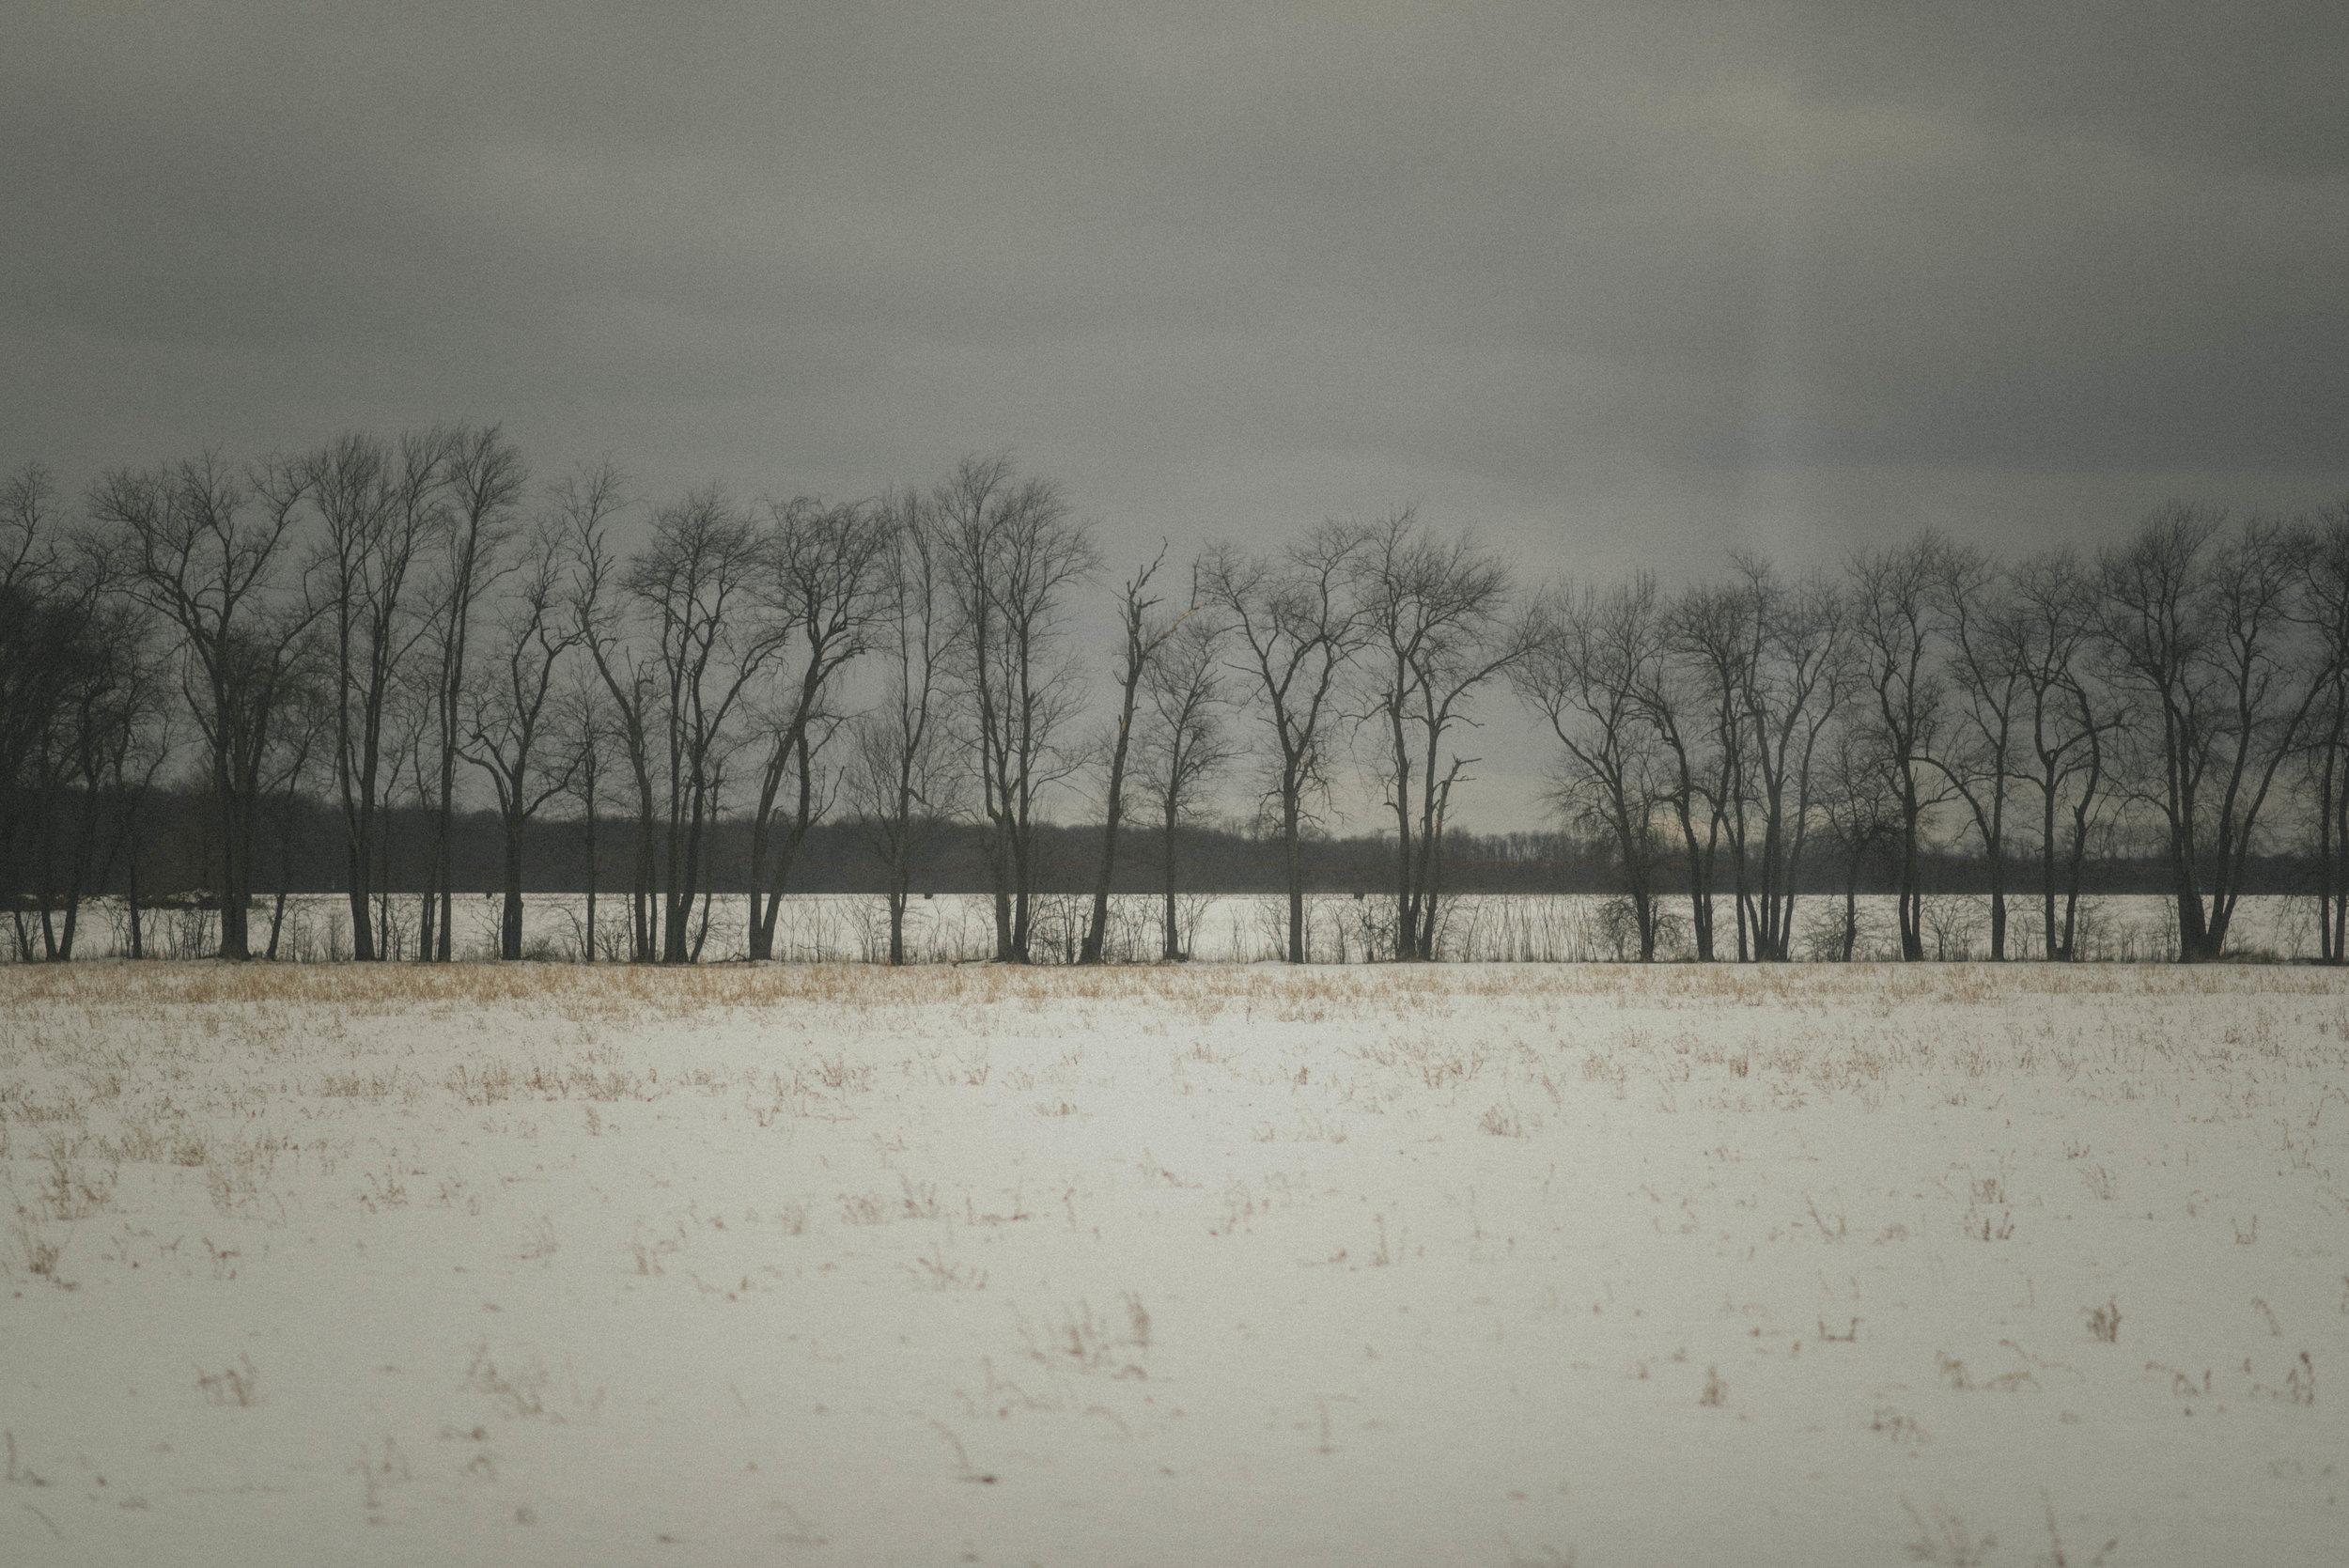 Michigan Scenery - High Res-3.jpg